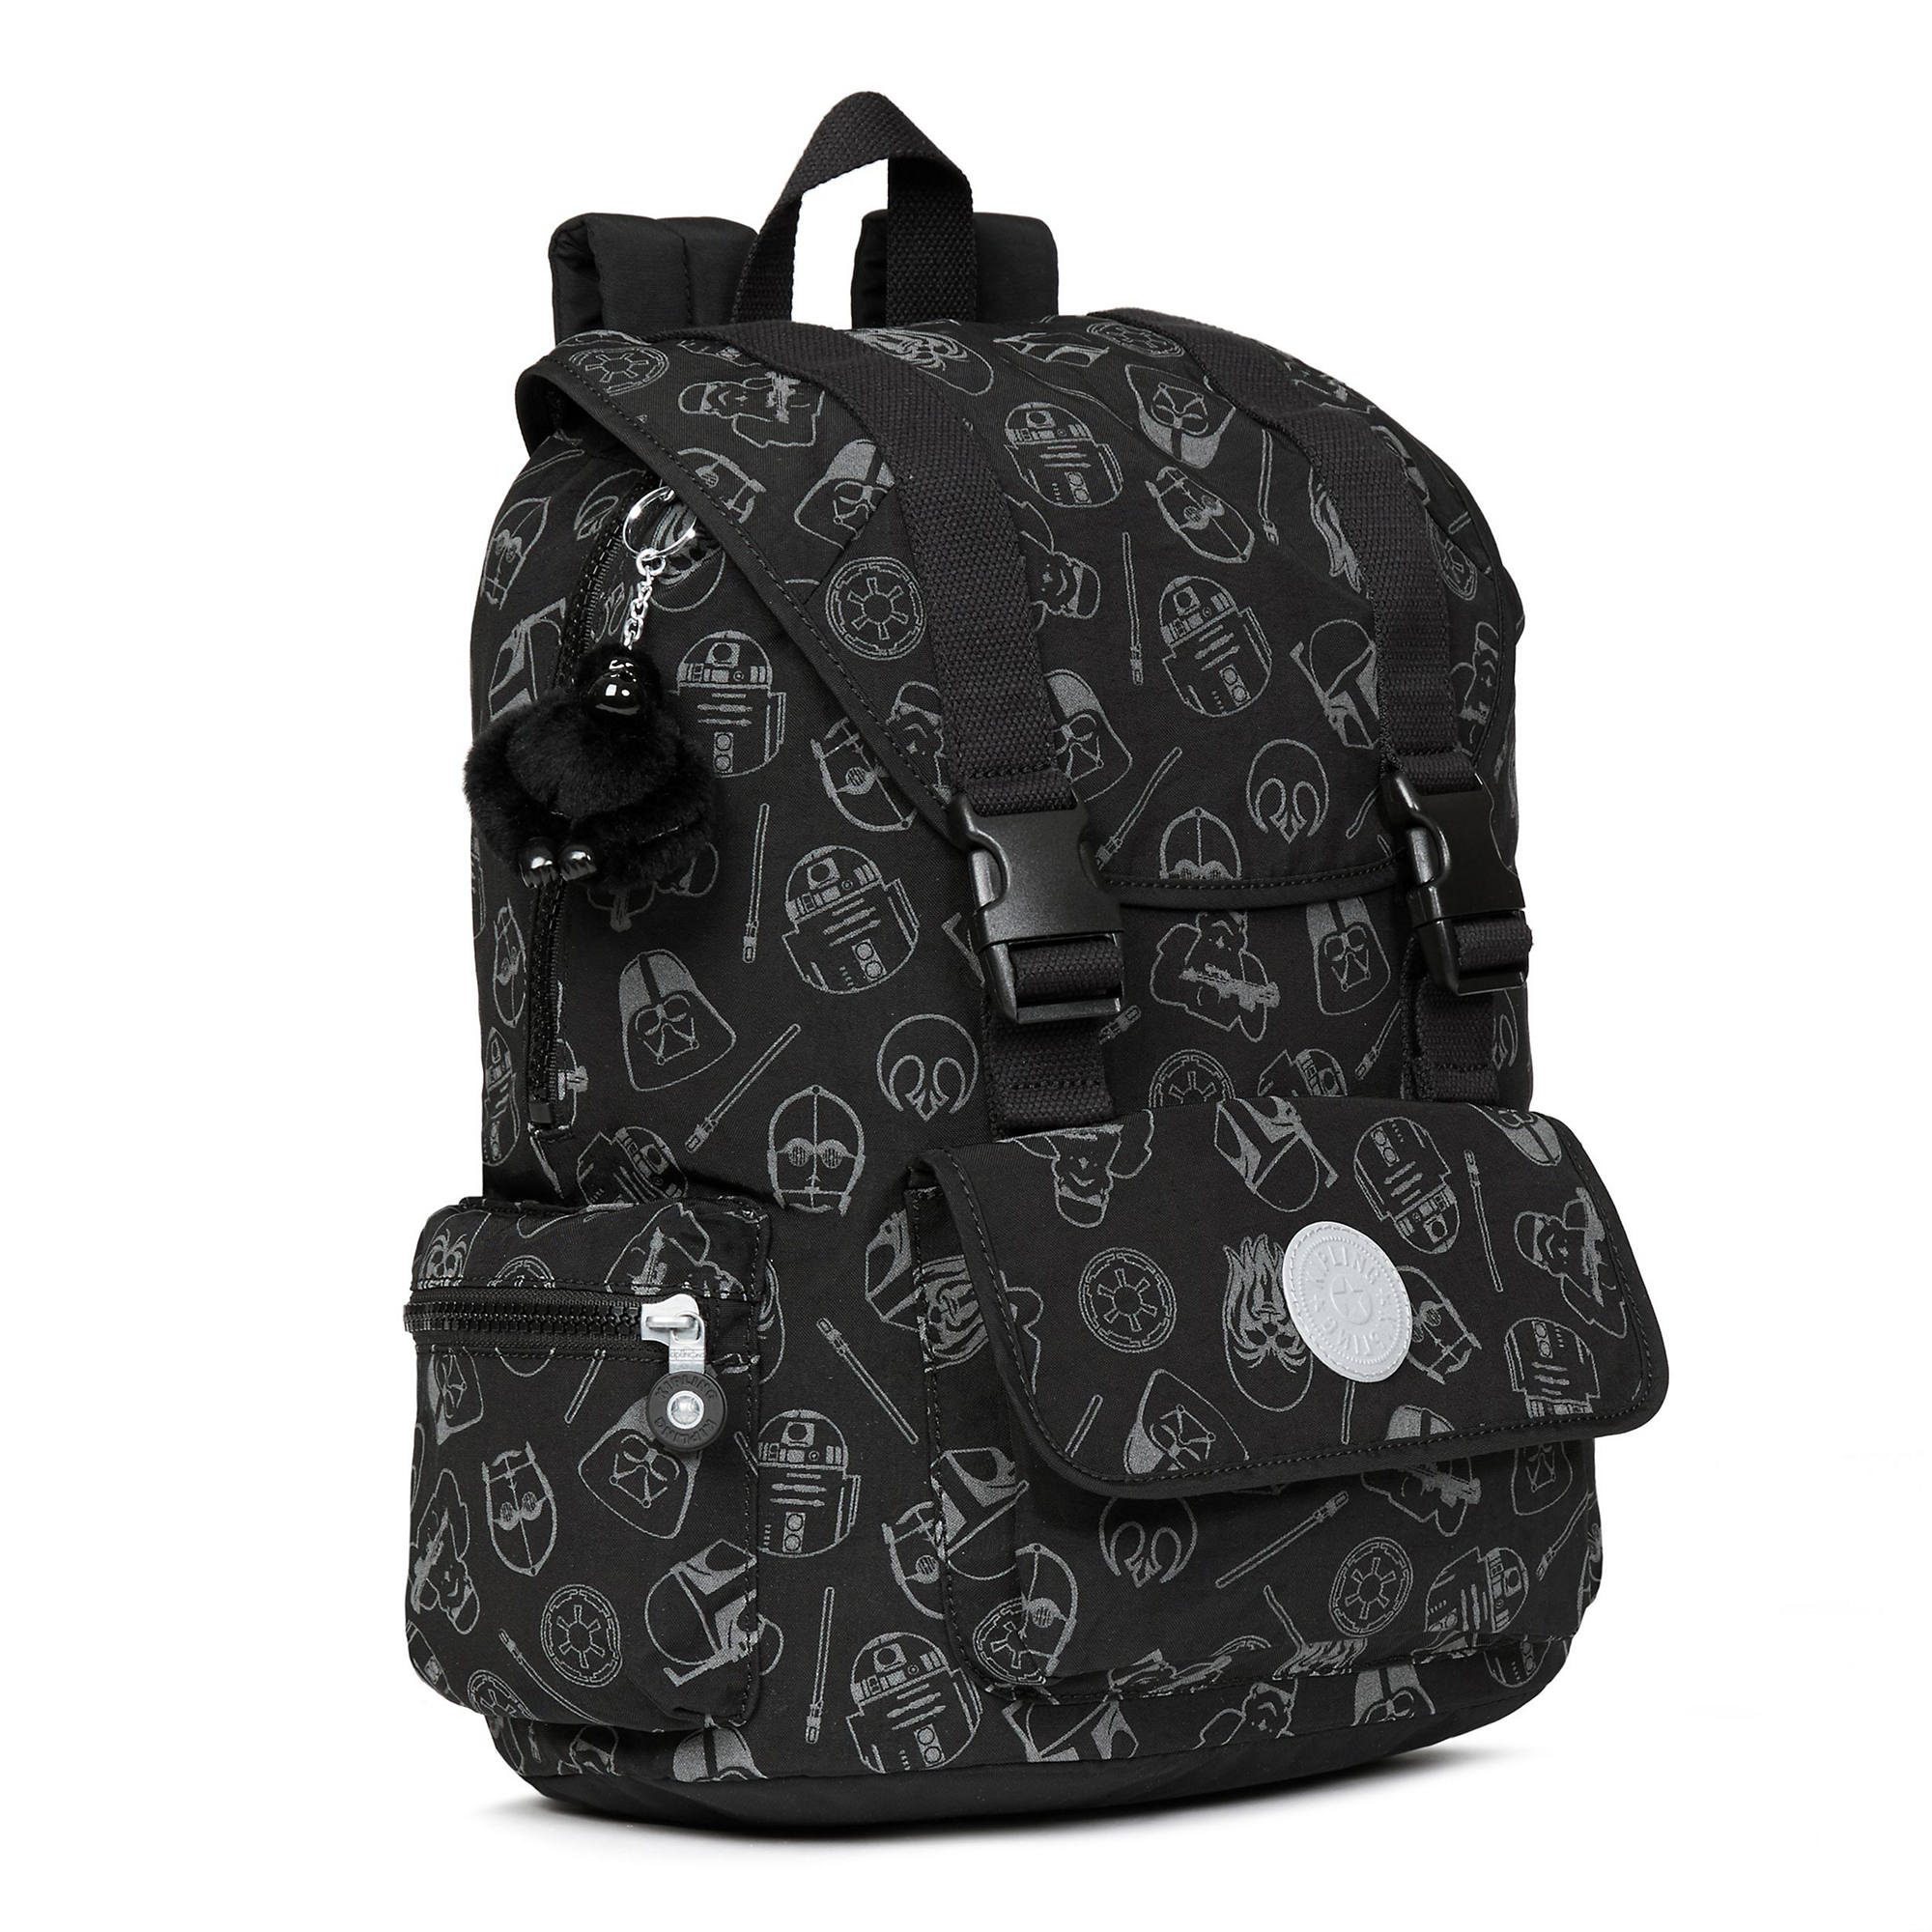 Star Wars Siggy Printed Large Reflective Laptop Backpack Galaxy Far Away